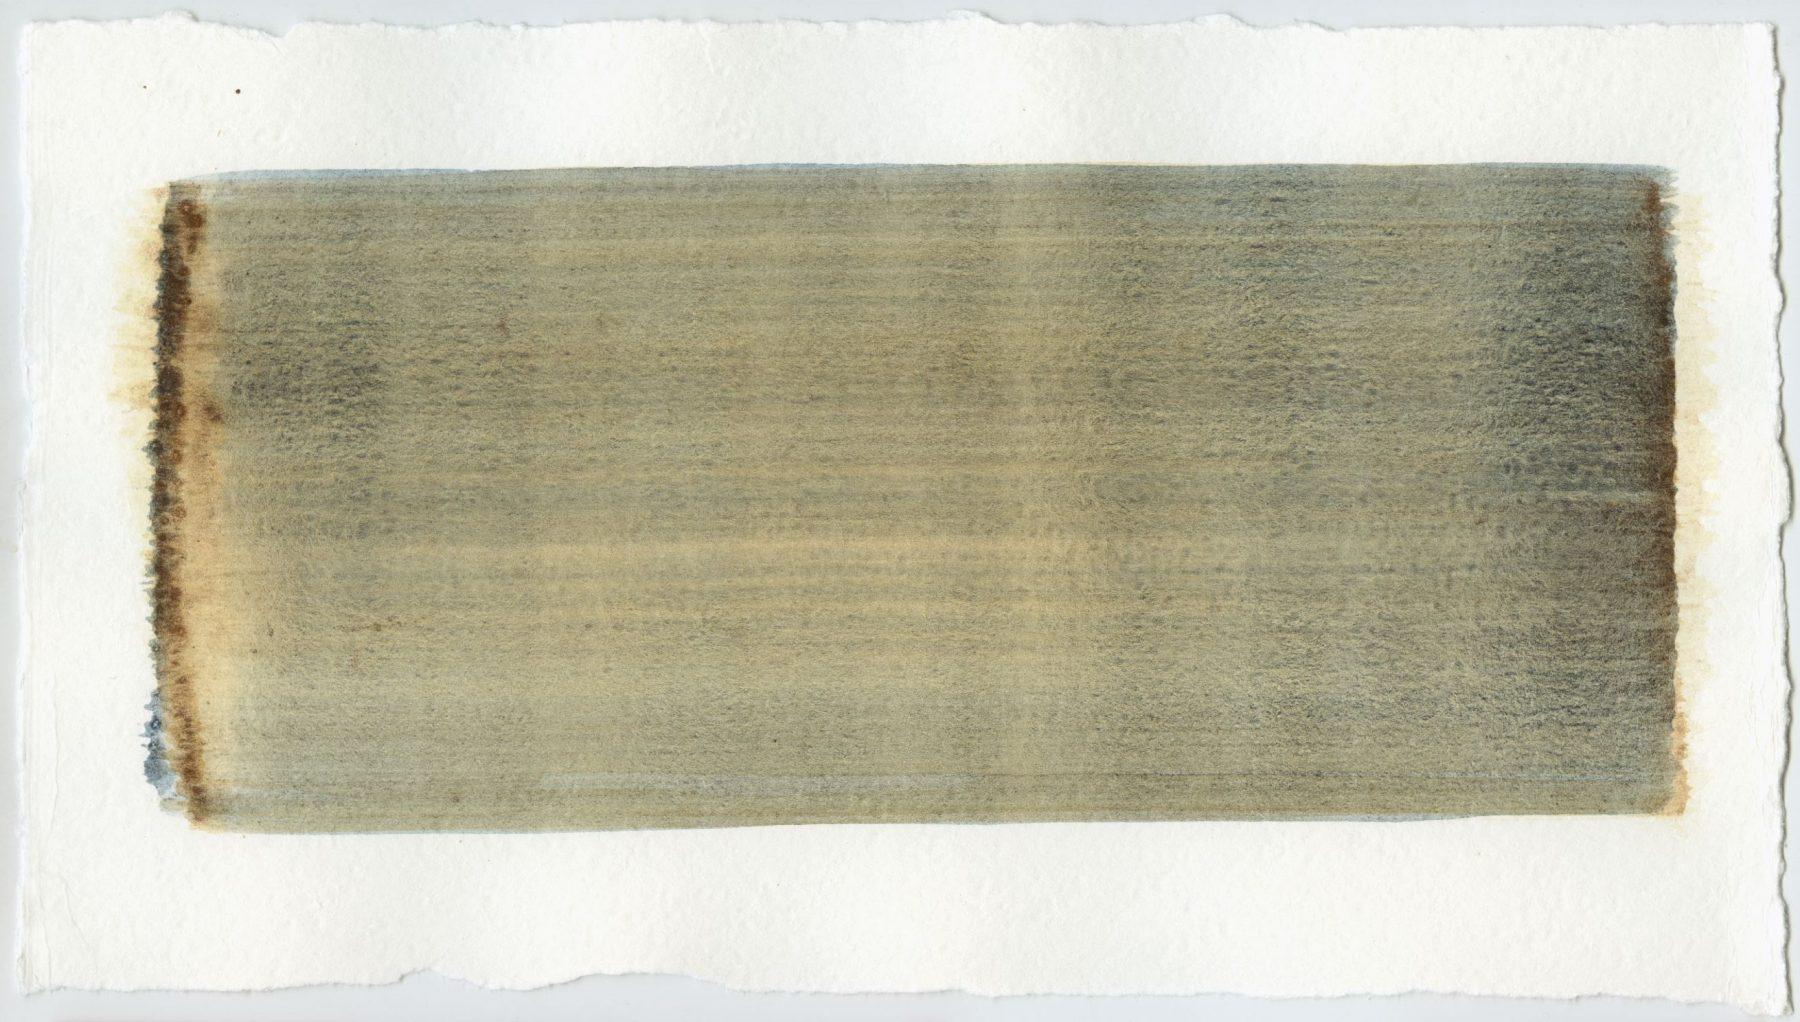 Brush stroke no. 110 - Pigment: Vivianiet (from Kremer Pigmente) Selfmade pigment: IJzeroer